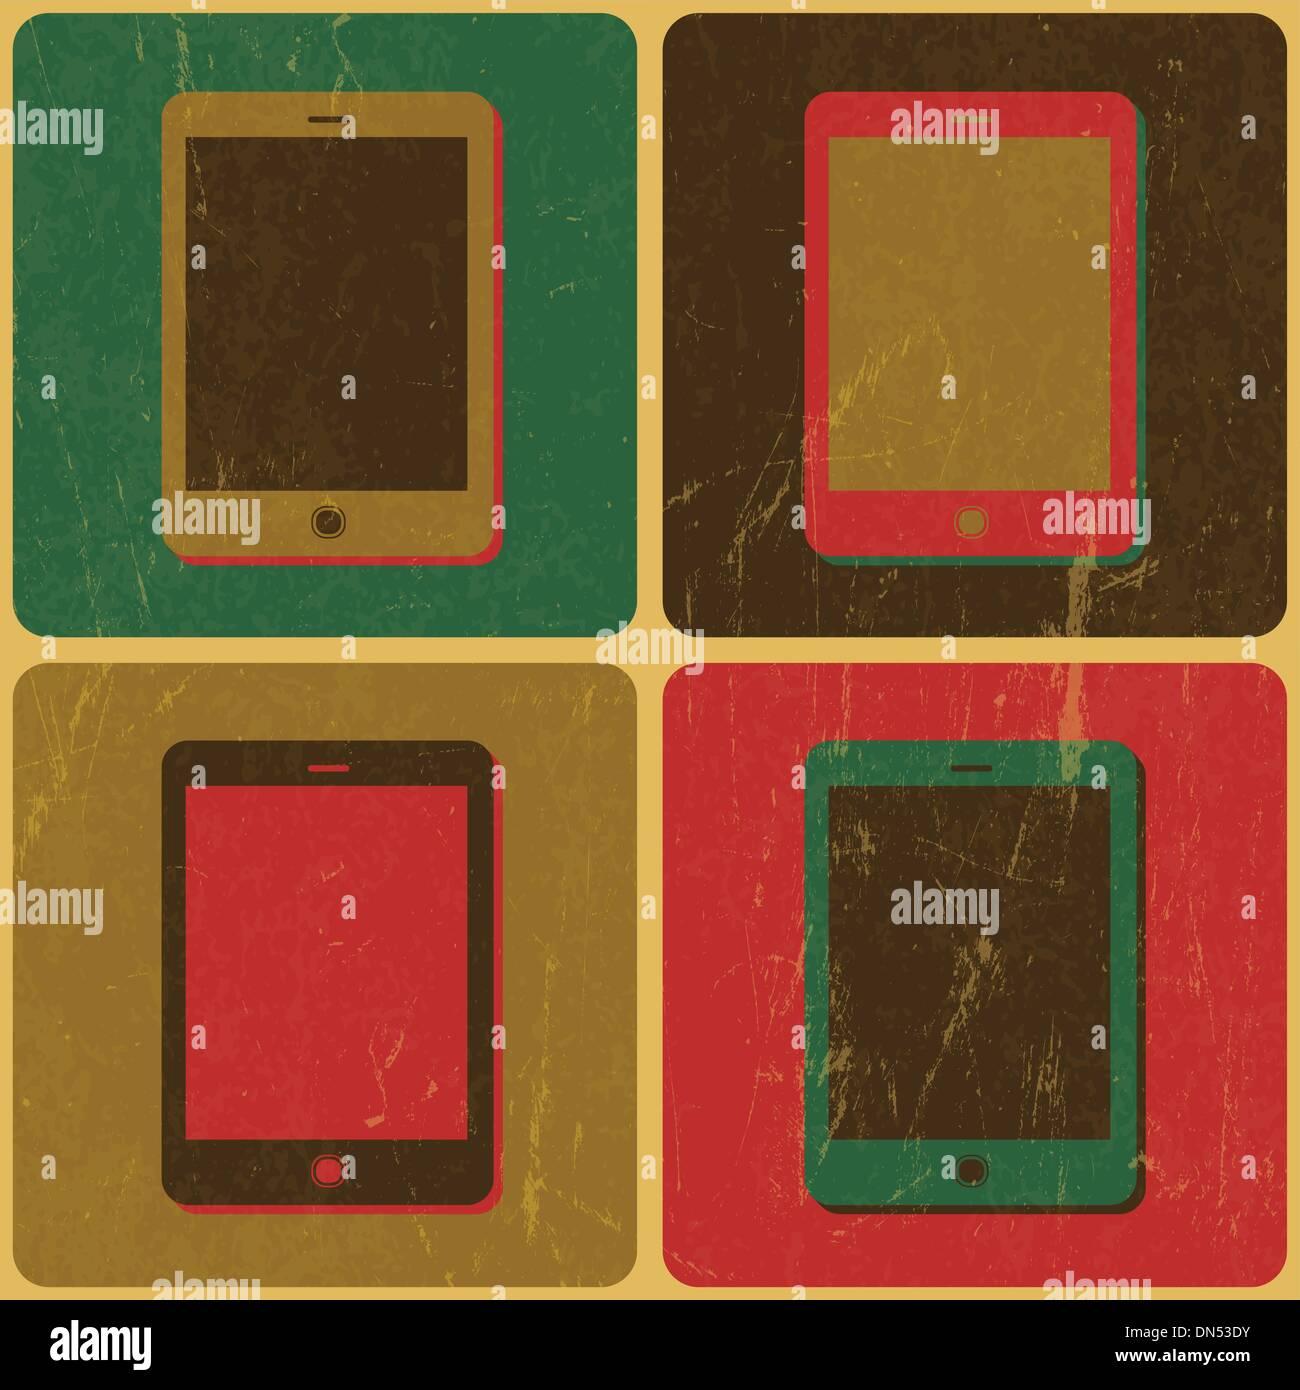 Póster de teléfono inteligente, estilo Pop-Art, Vector Imagen De Stock